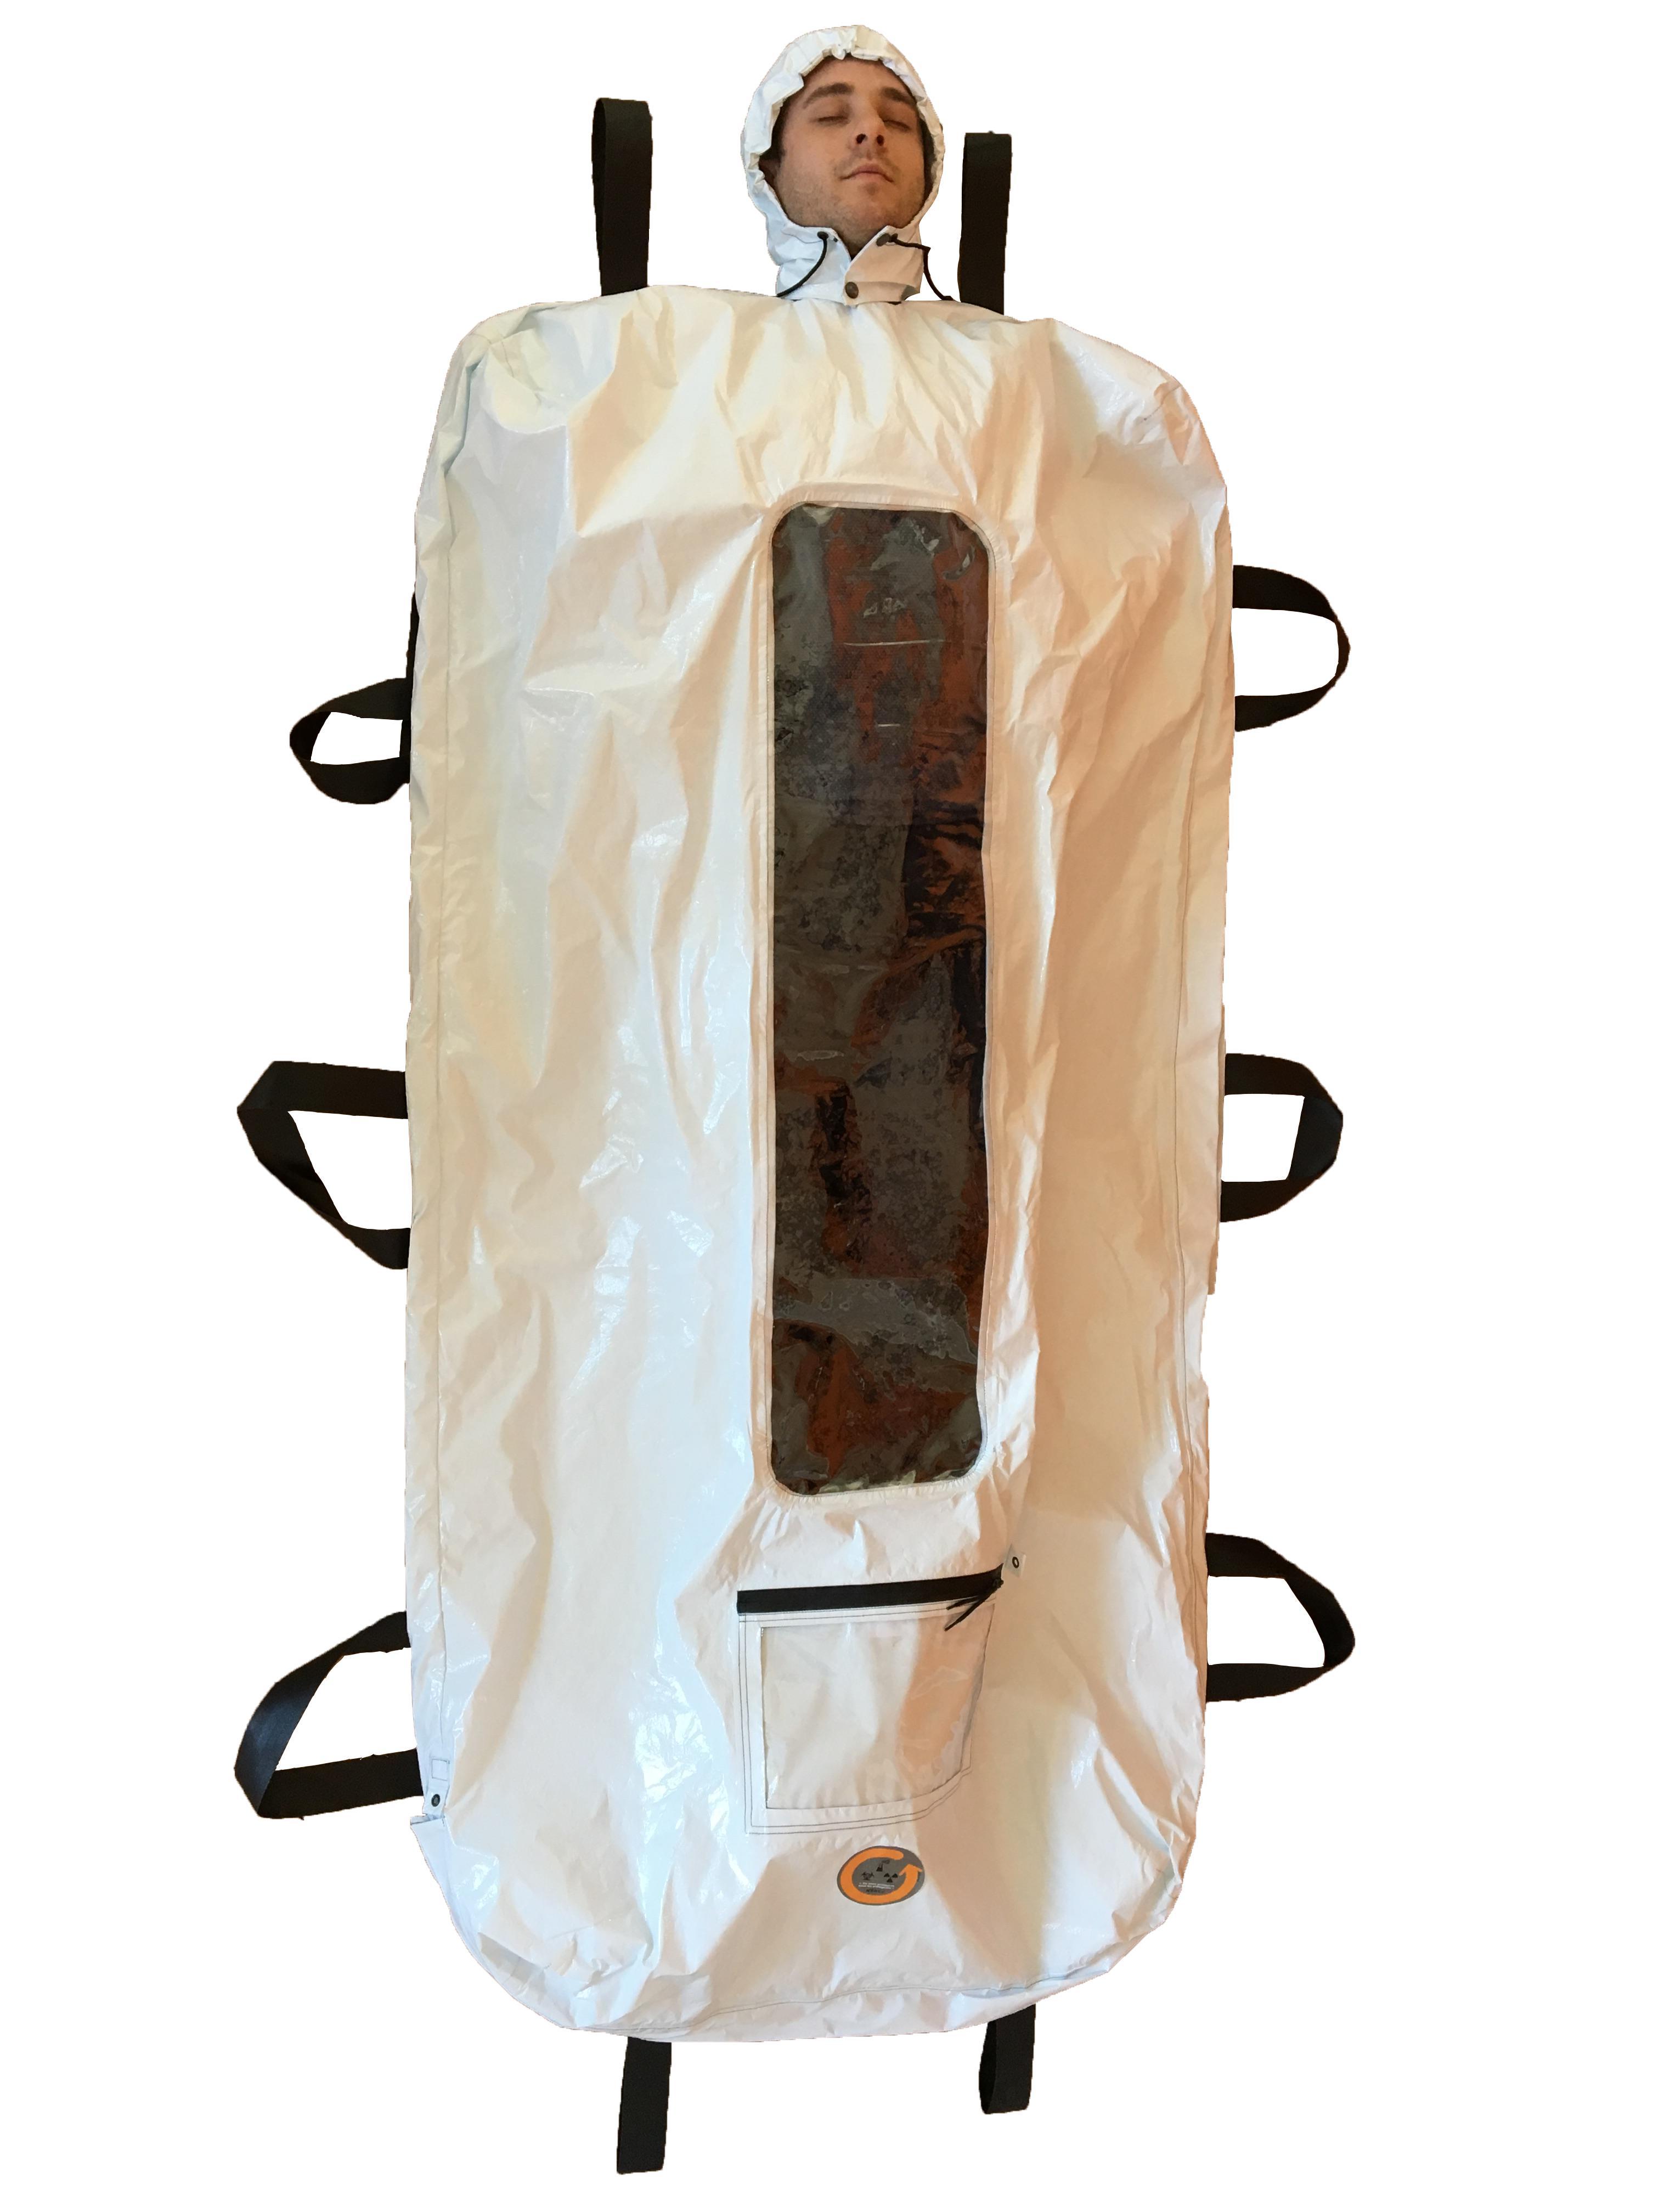 Evacuation bag